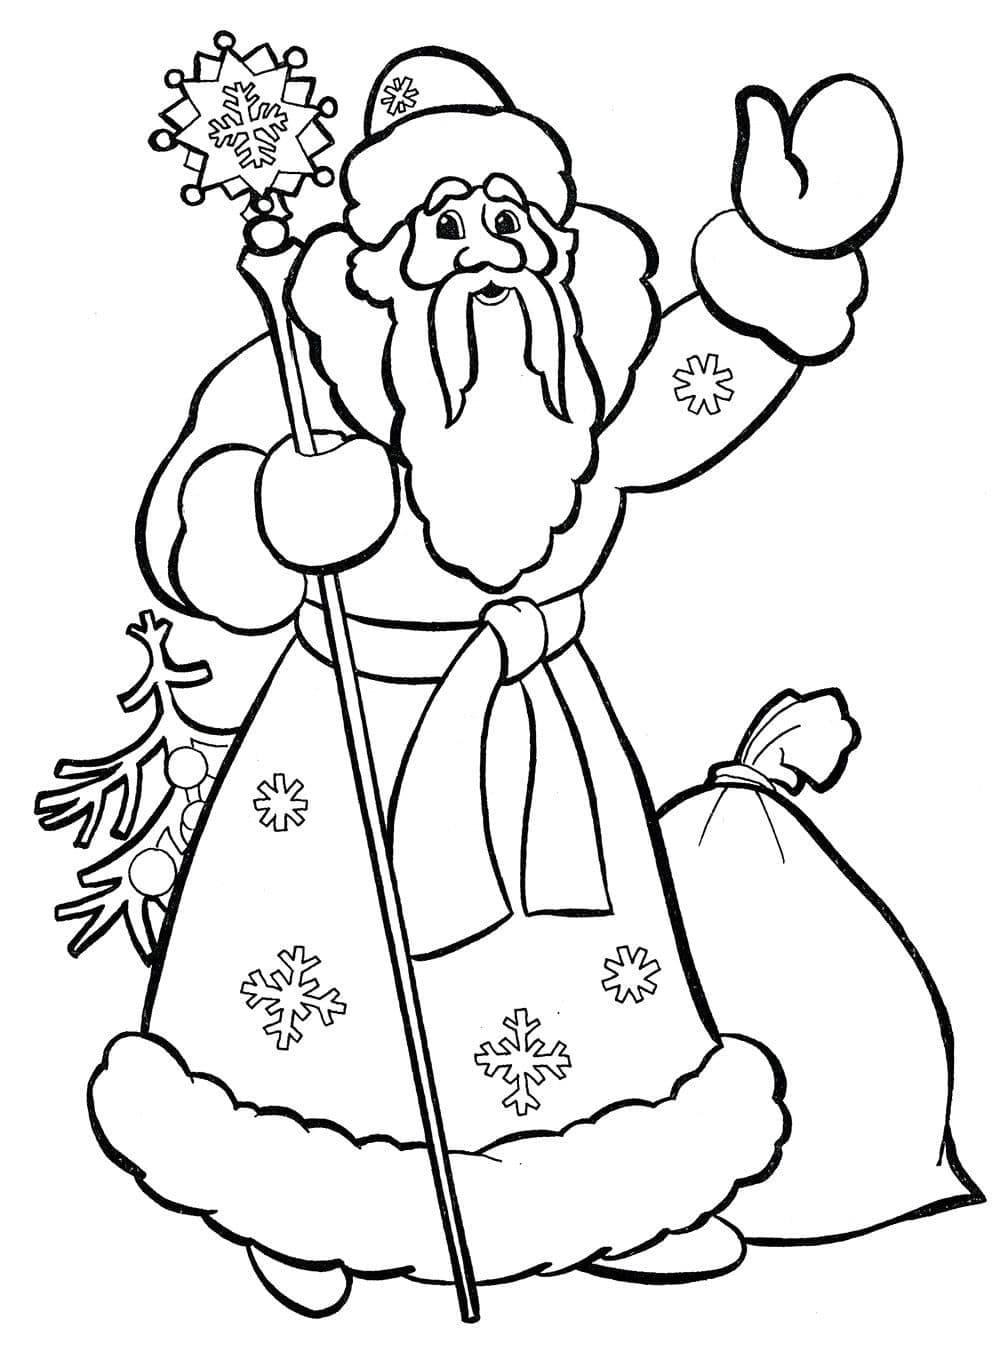 Приветик, открытки раскраски дед мороз